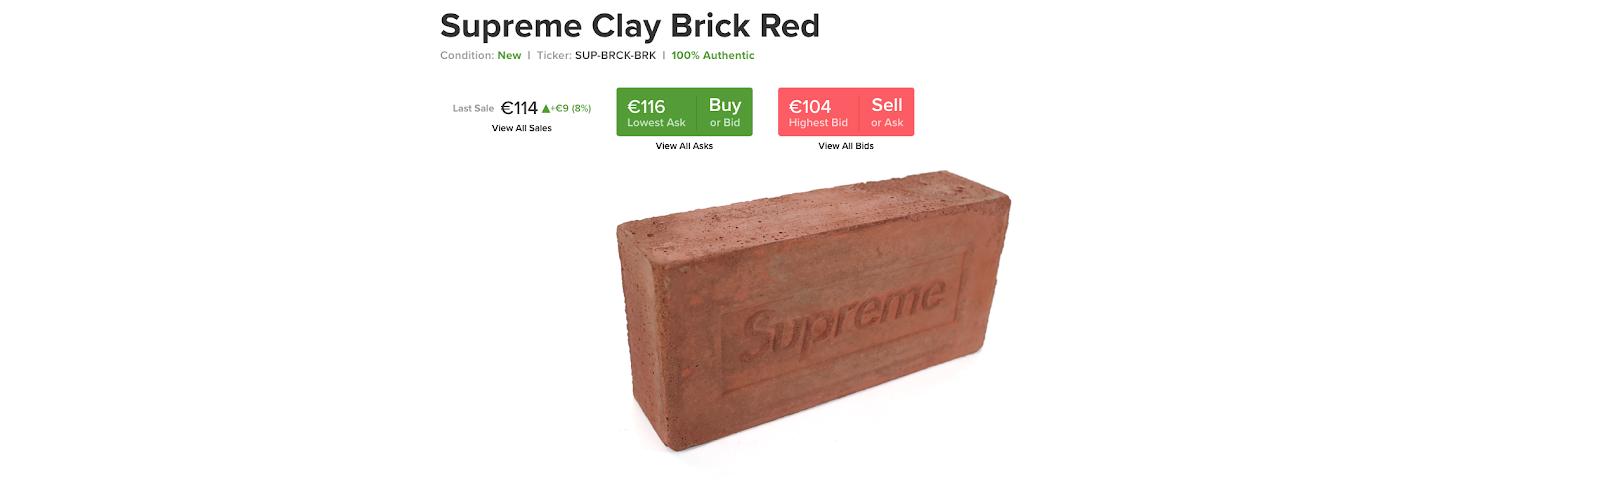 scarcity supreme 2